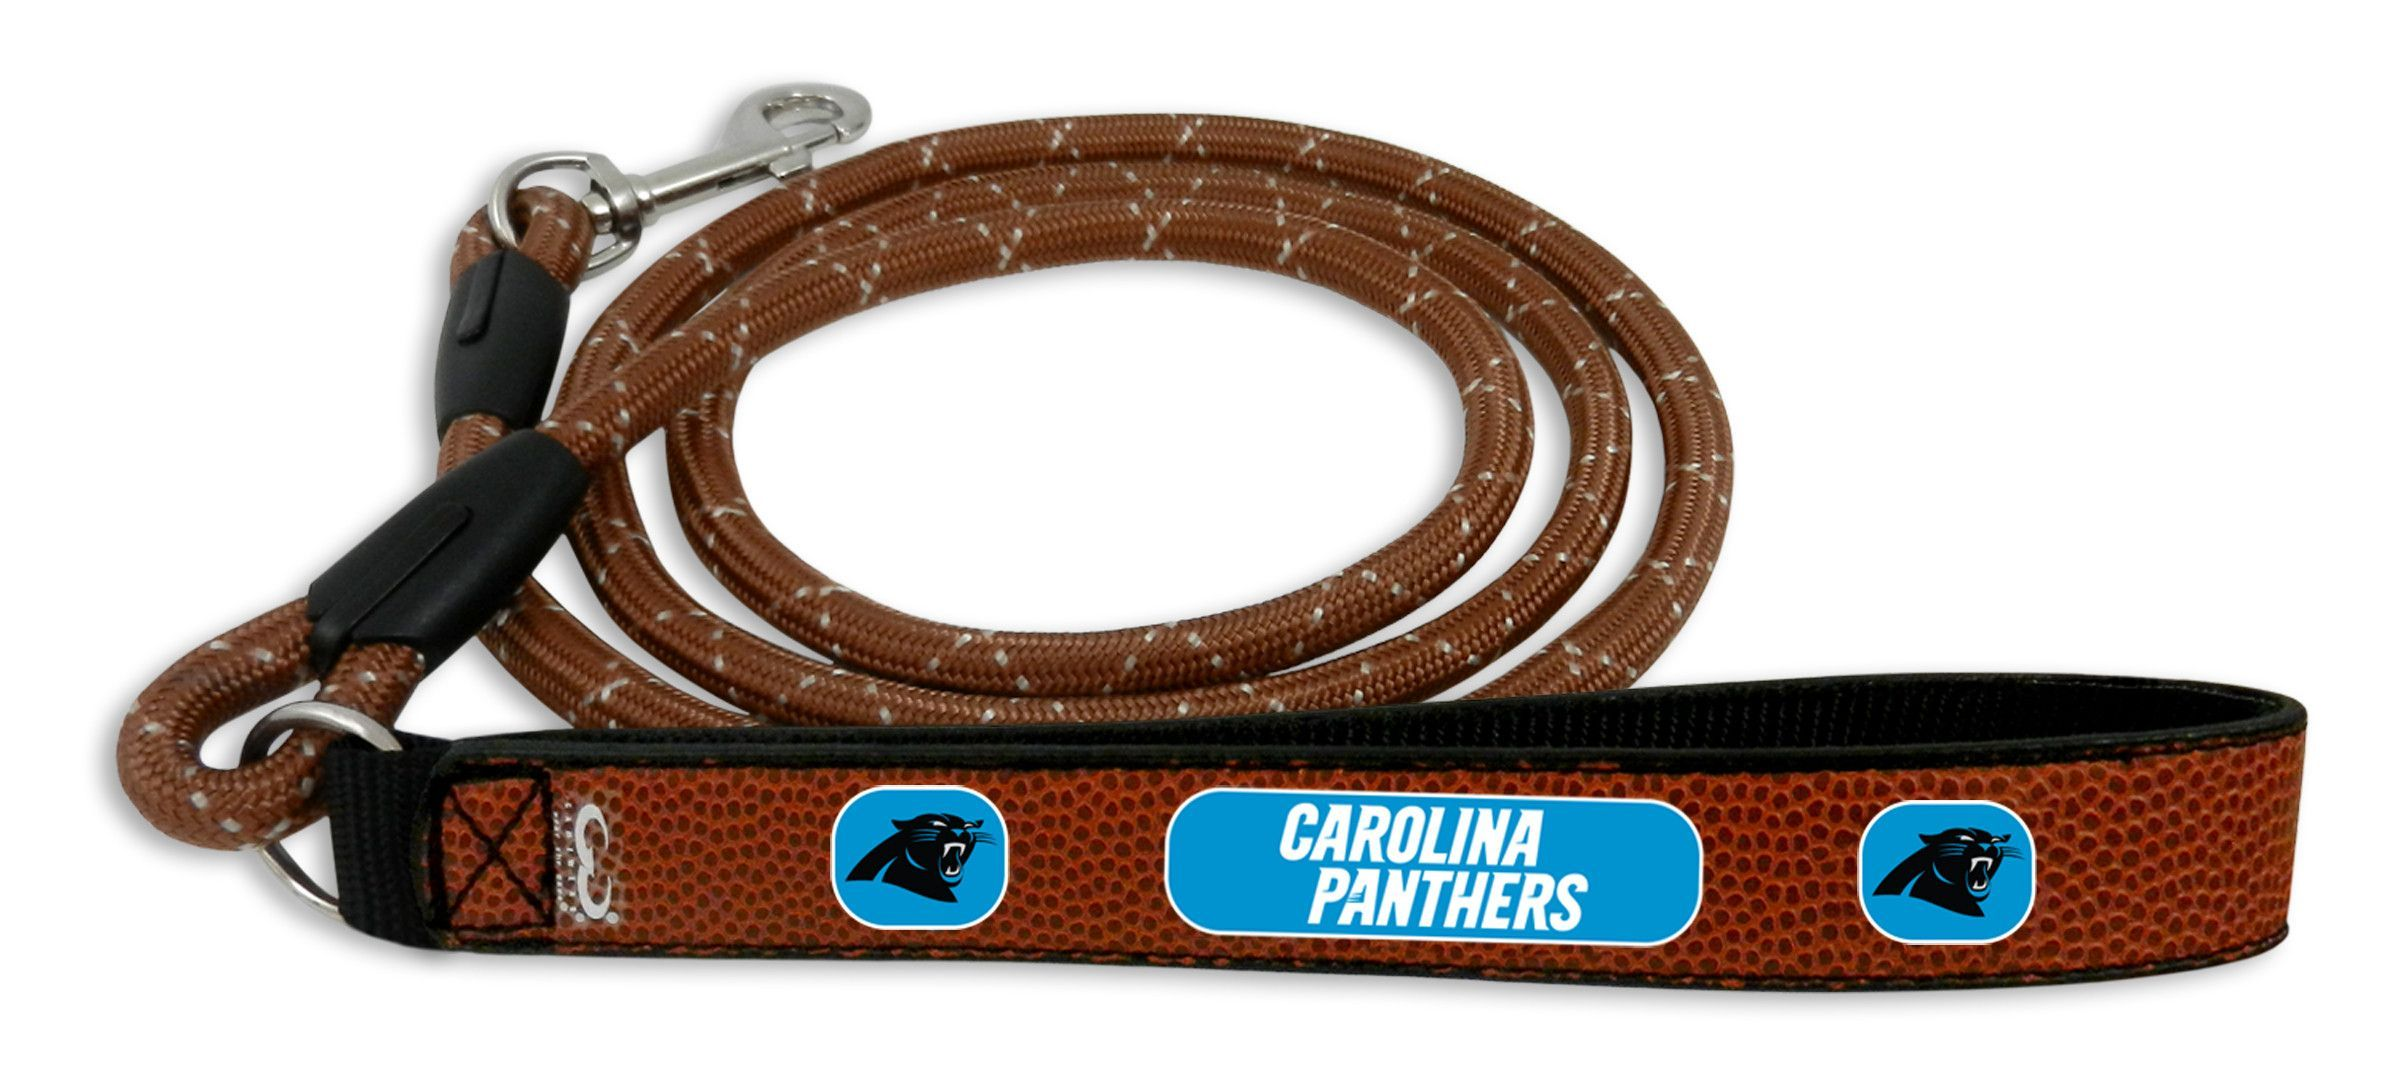 119308025 Carolina Panthers Football Leather Leash - L